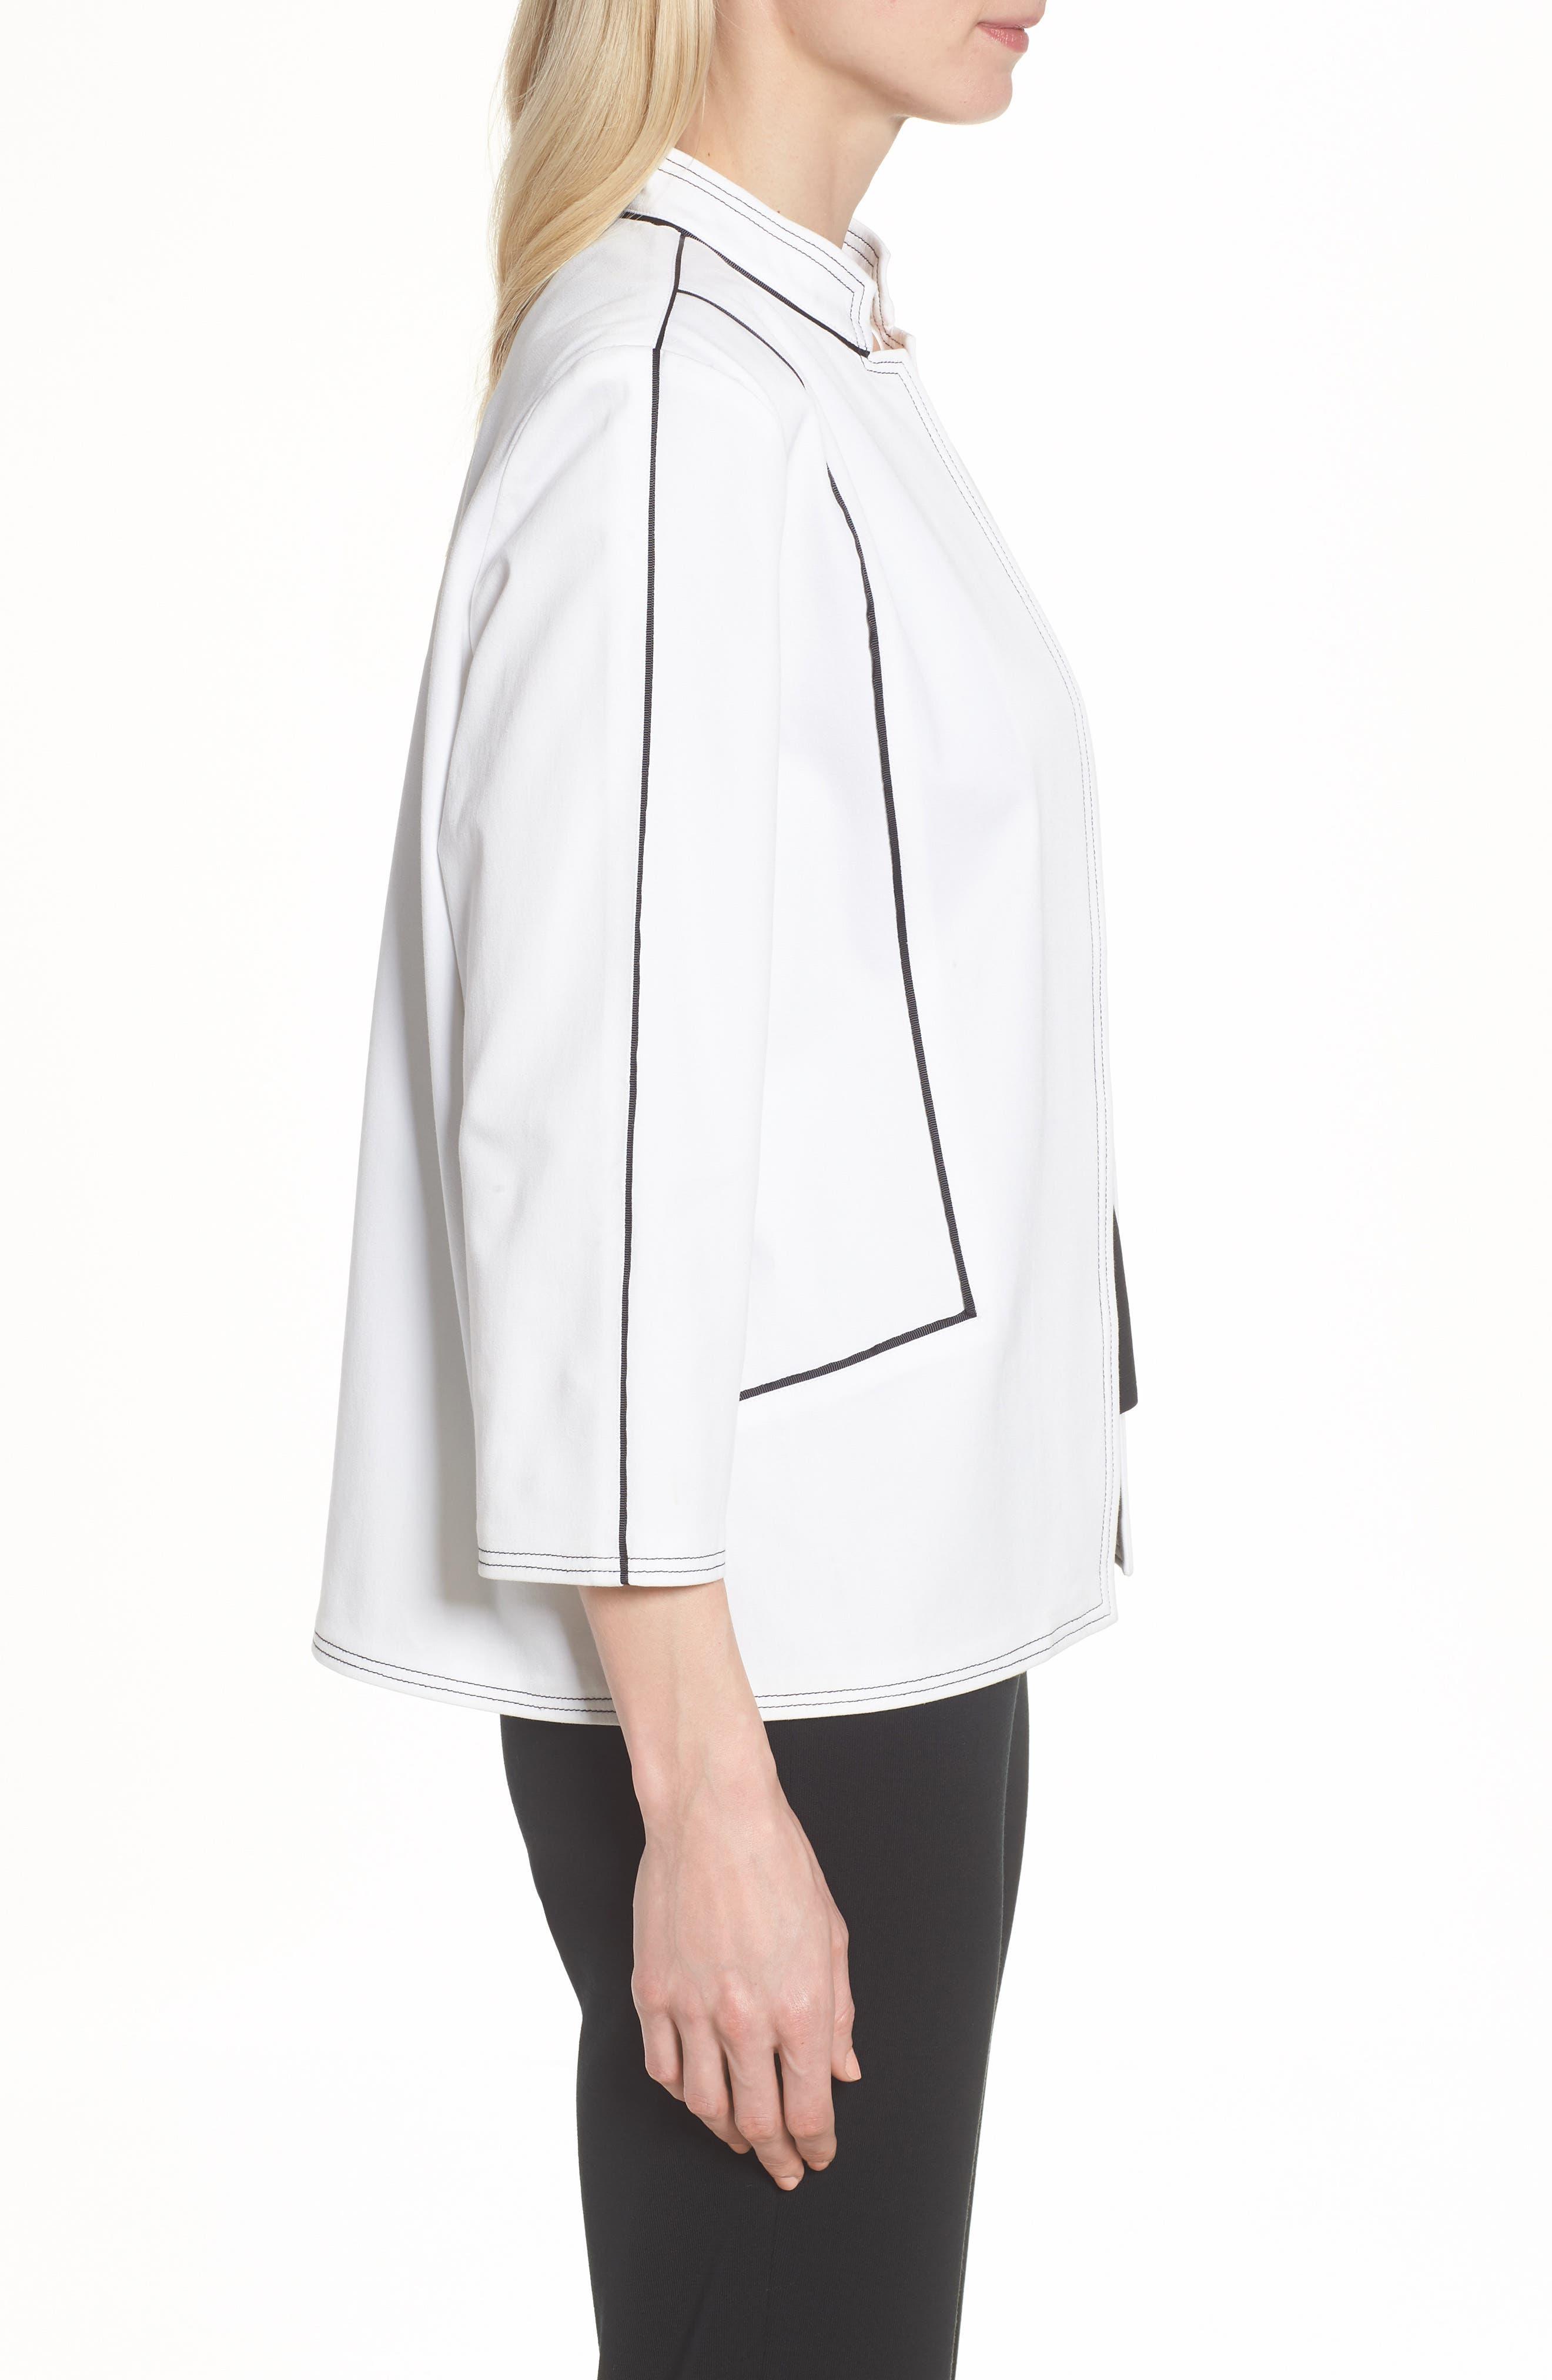 Mandarin Collar Stitch Trim Jacket,                             Alternate thumbnail 3, color,                             White/ Black